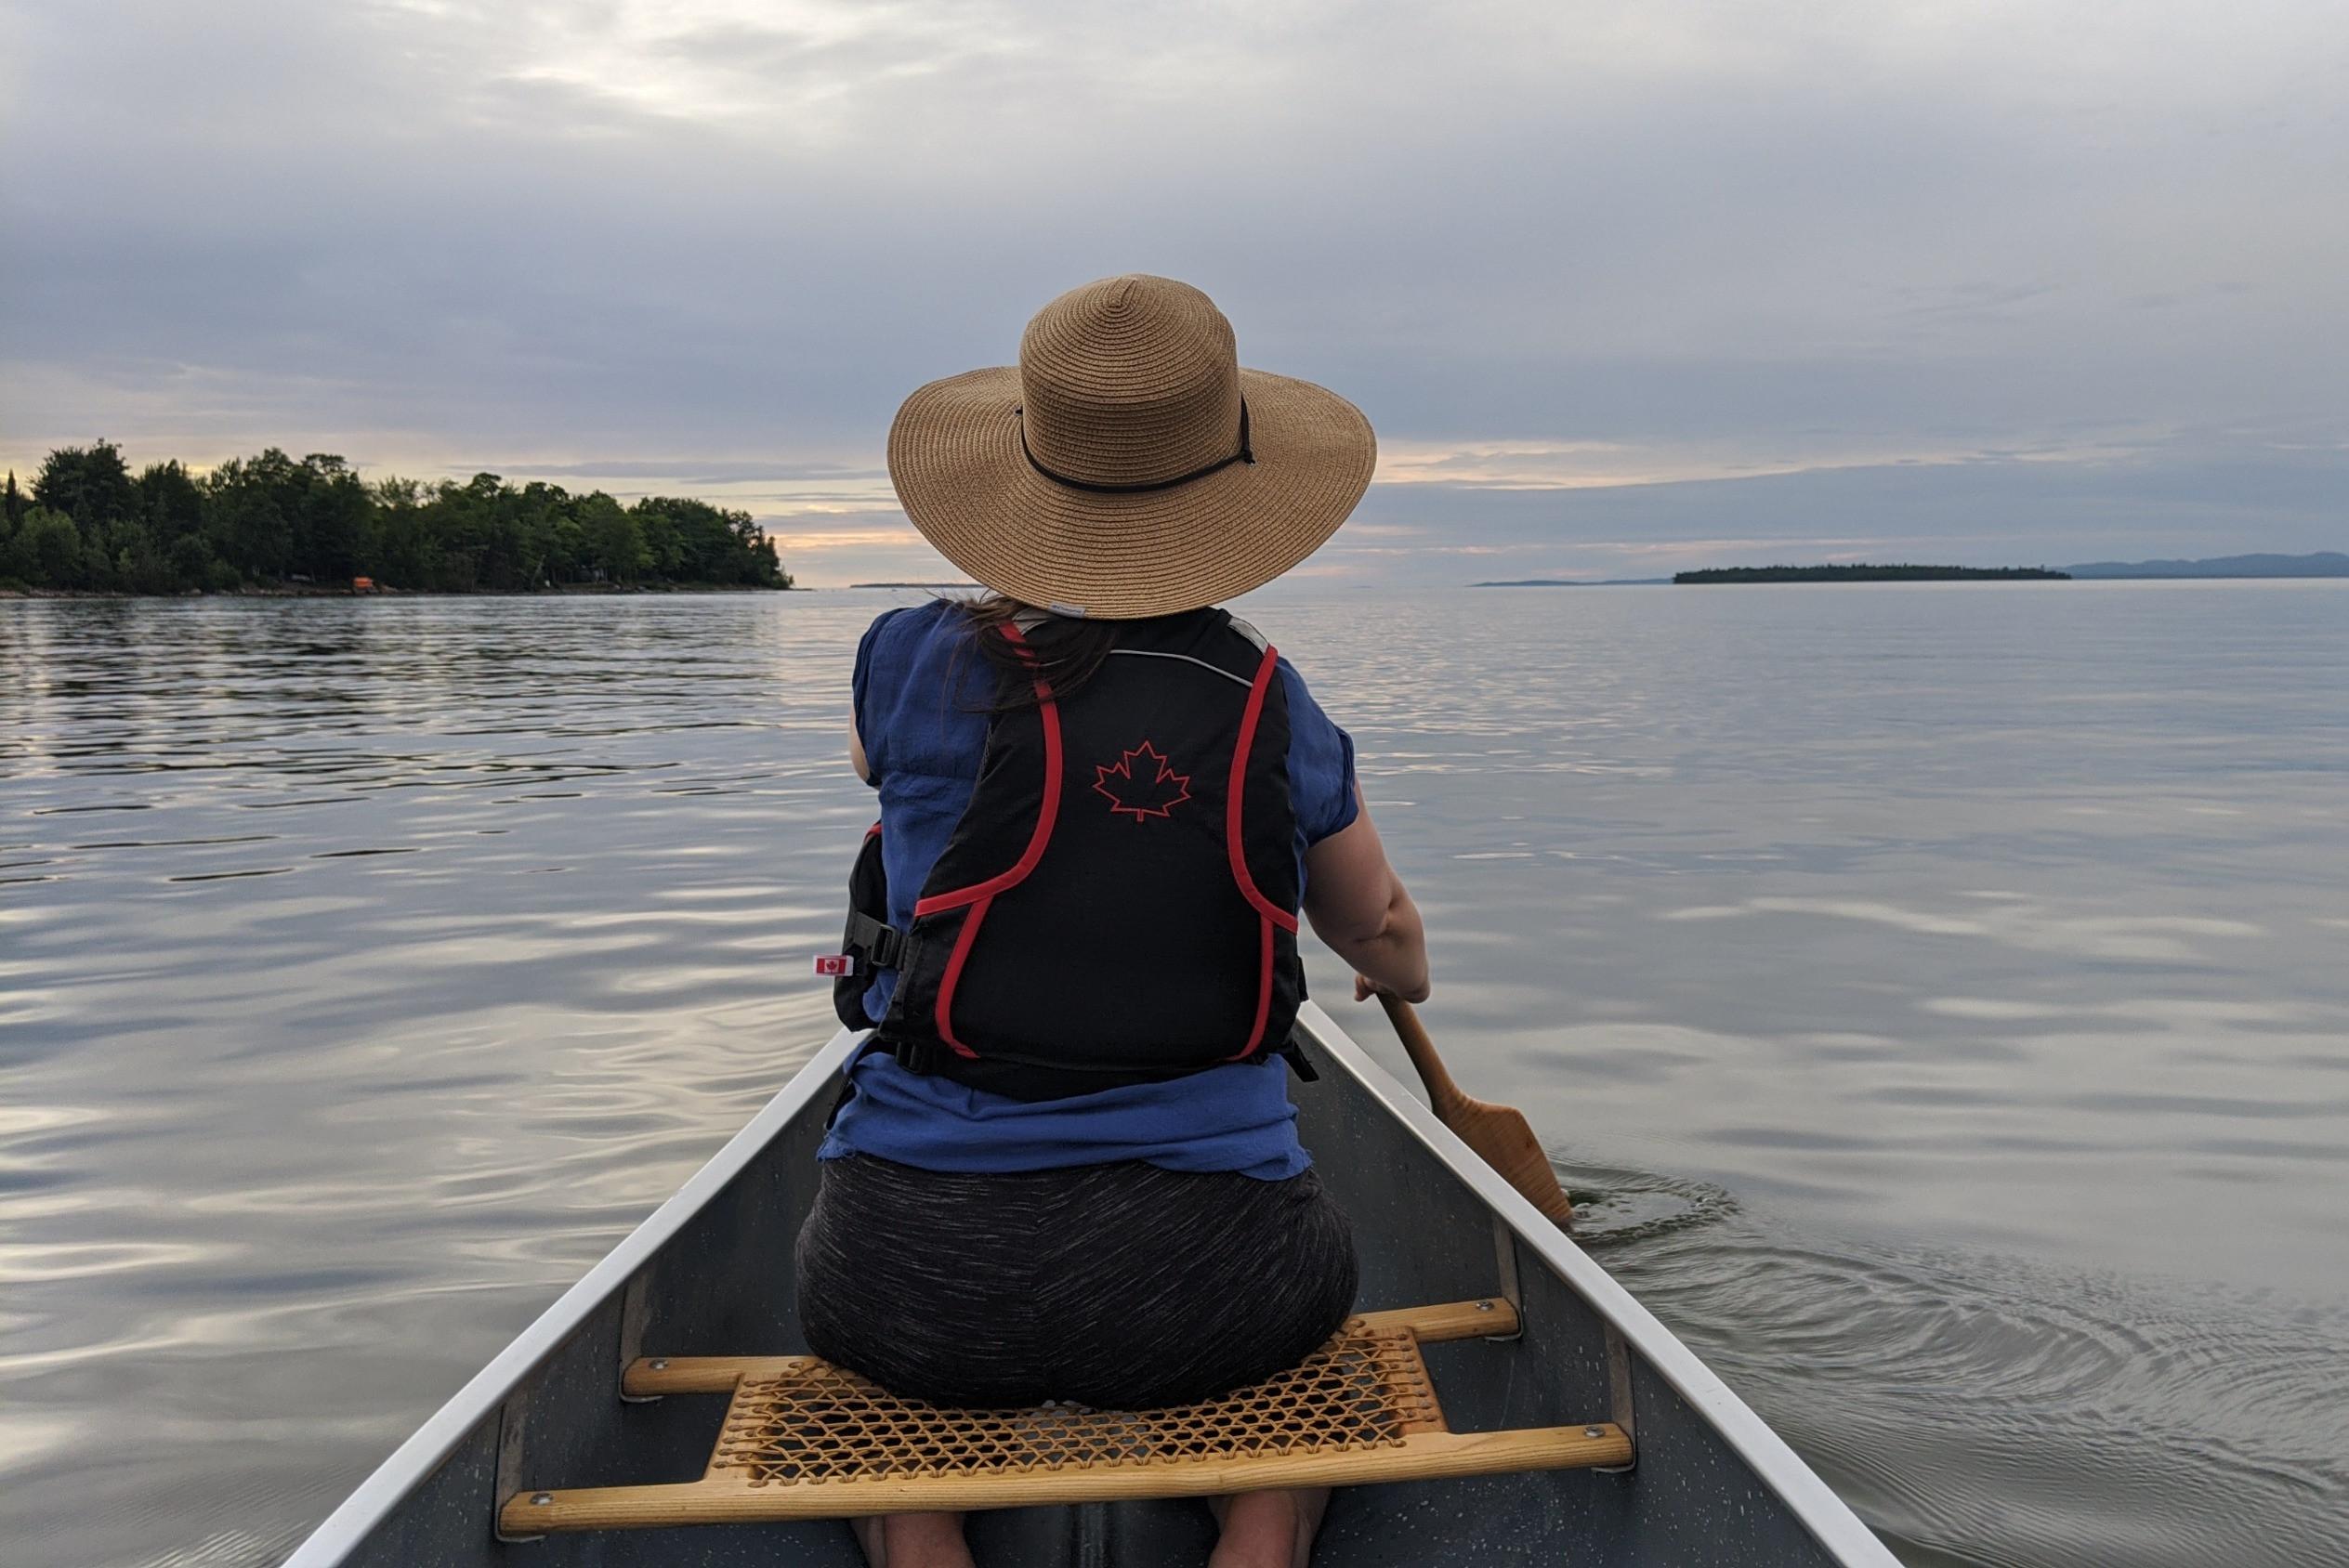 Guided Interpretive Canoe Tour: 4 hours